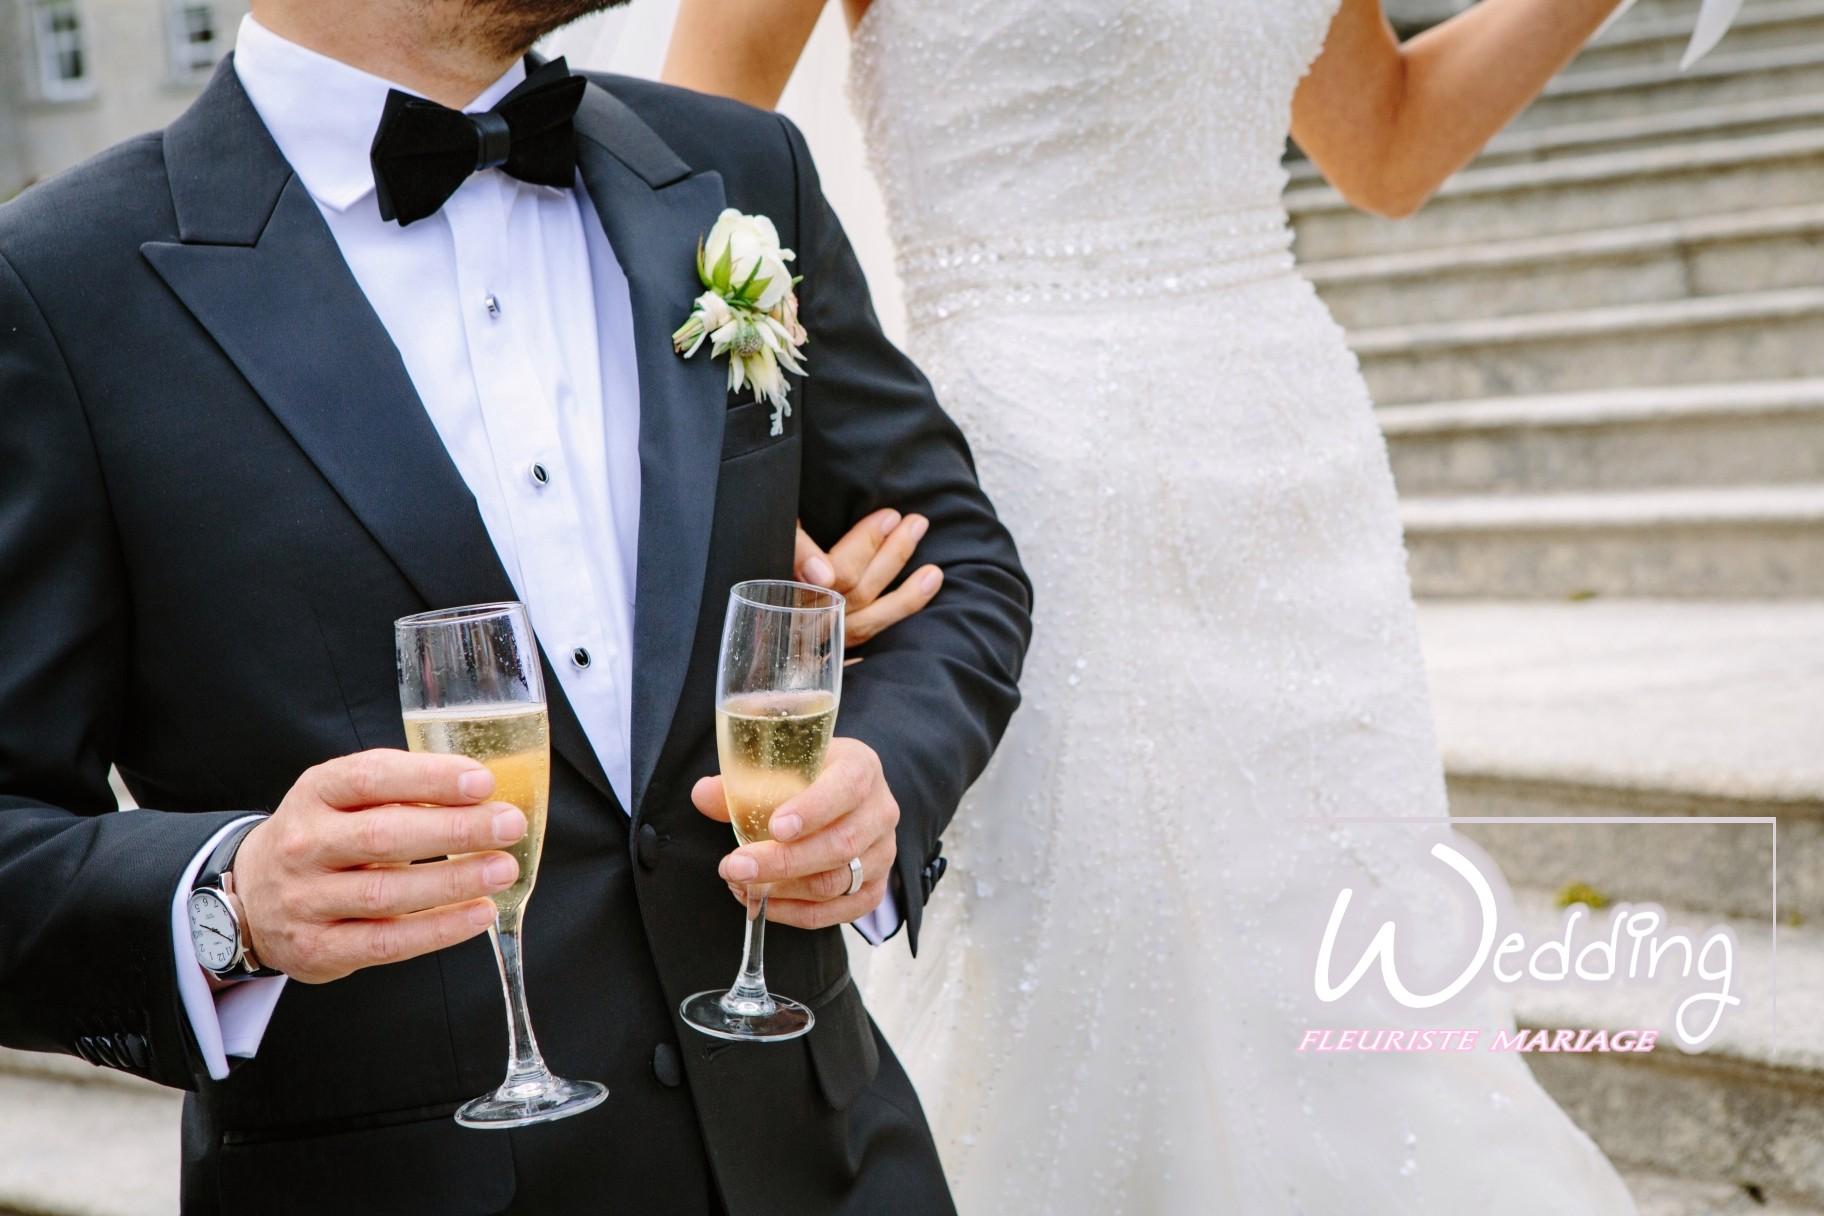 BOUTONNIÈRE DU MARIÉ MANDELIEU - WEDDING FLEURISTE MARIAGE MANDELIEU